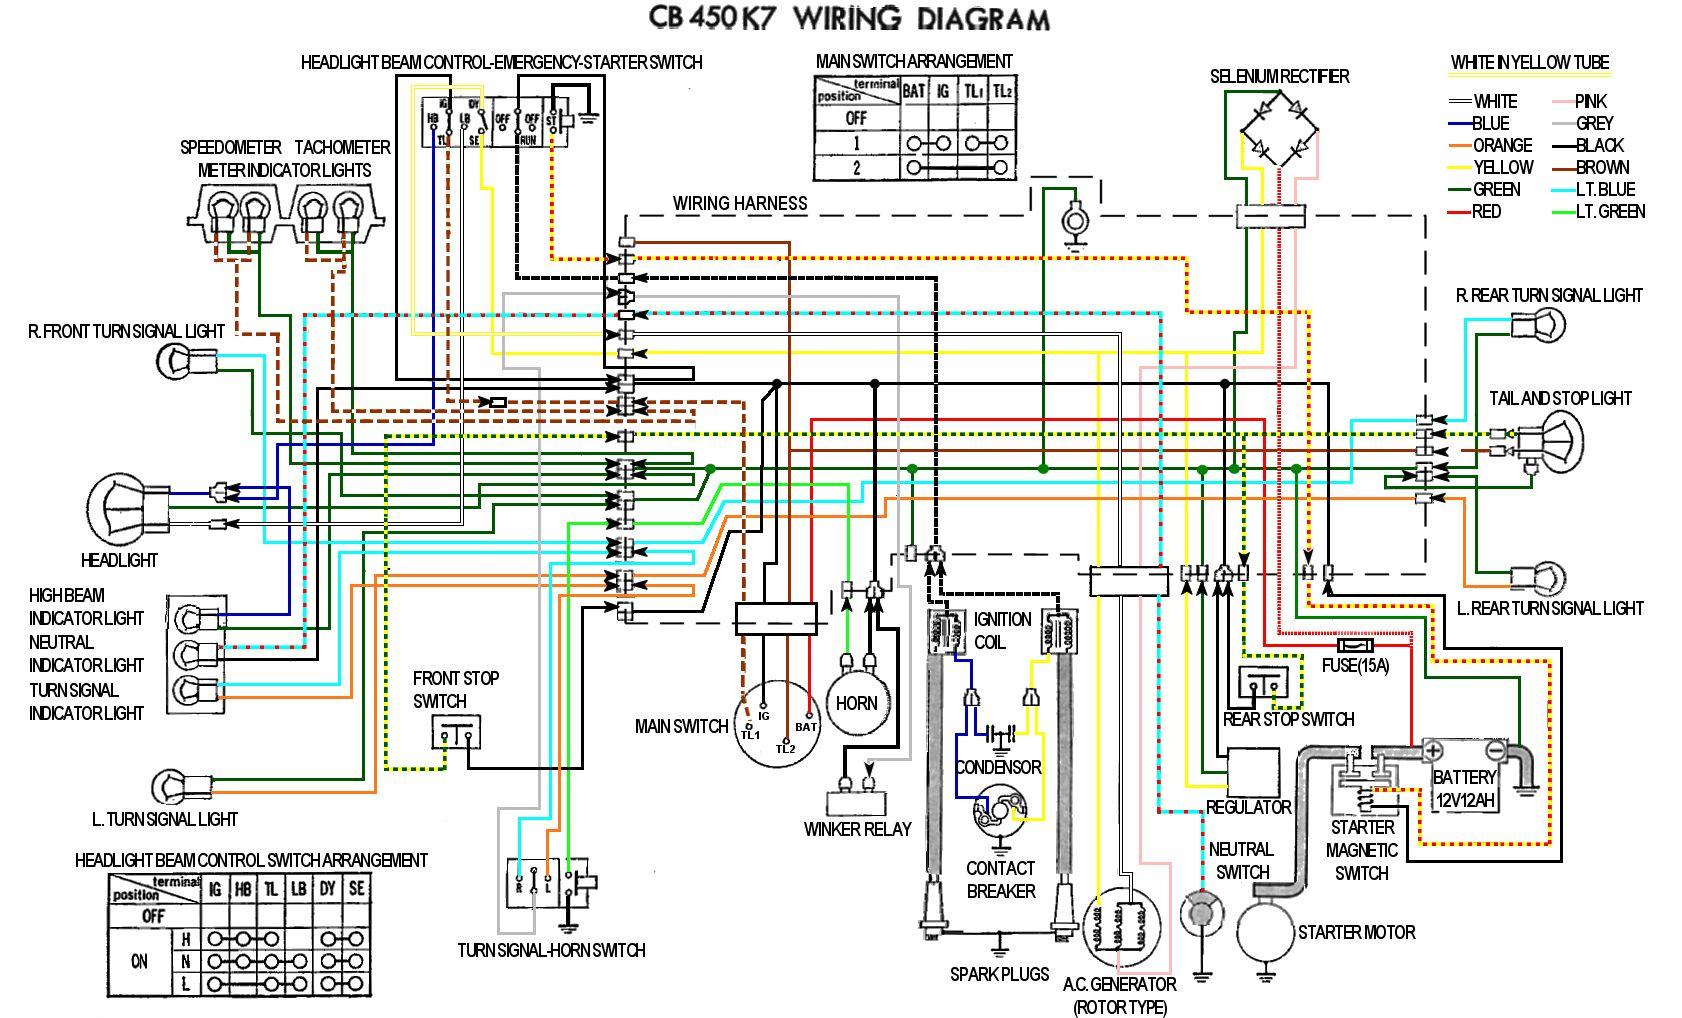 Cb900f Switch Wiring Diagram 2010 Fatboy Wiring Diagram For Wiring Diagram Schematics